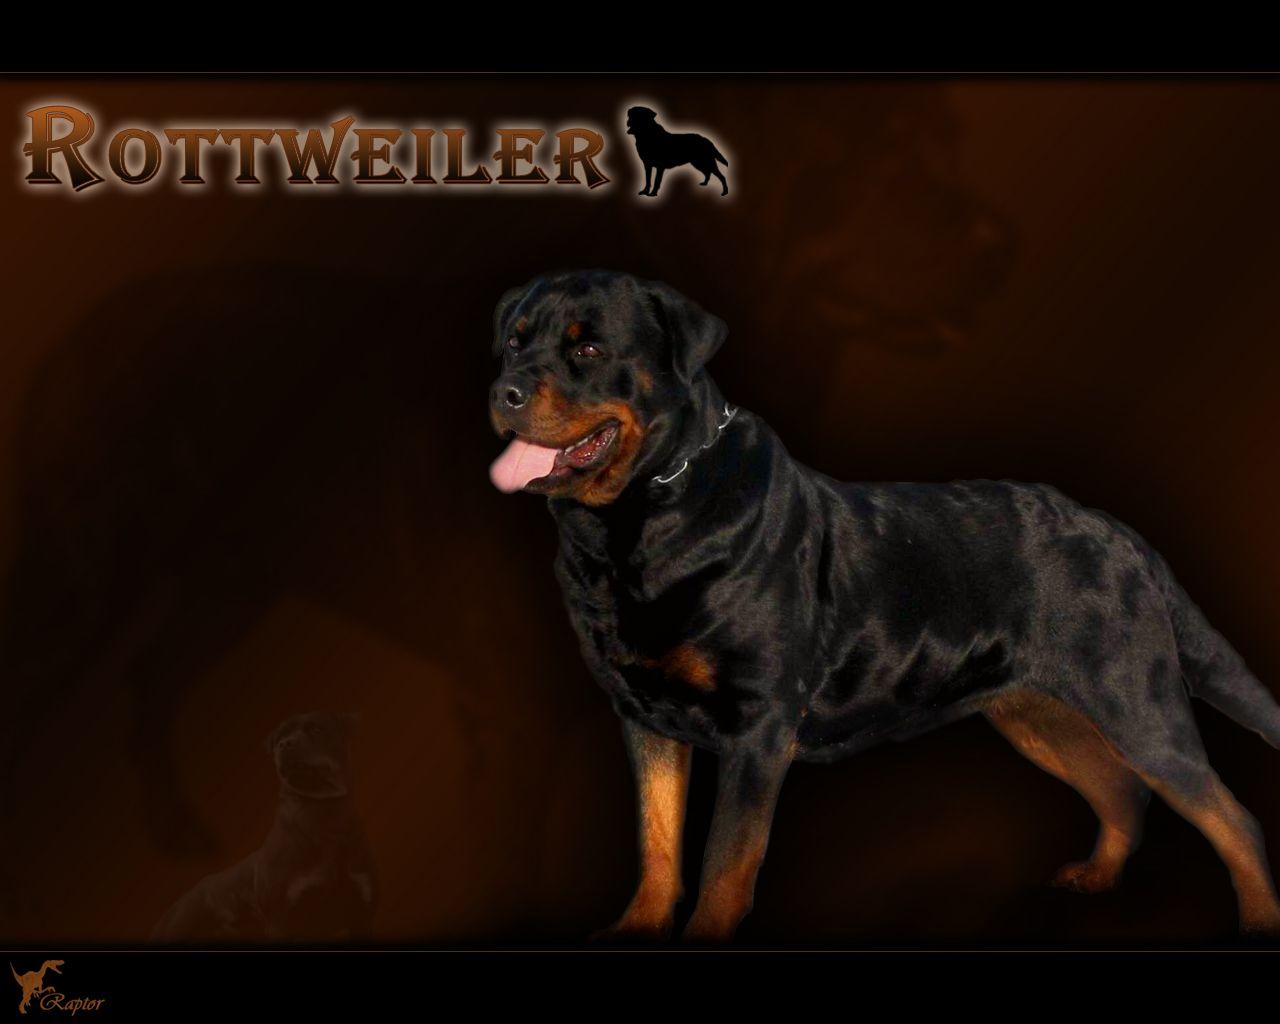 Rottweiler Wallpapers HD Download 1280x1024 Wallpaper 34